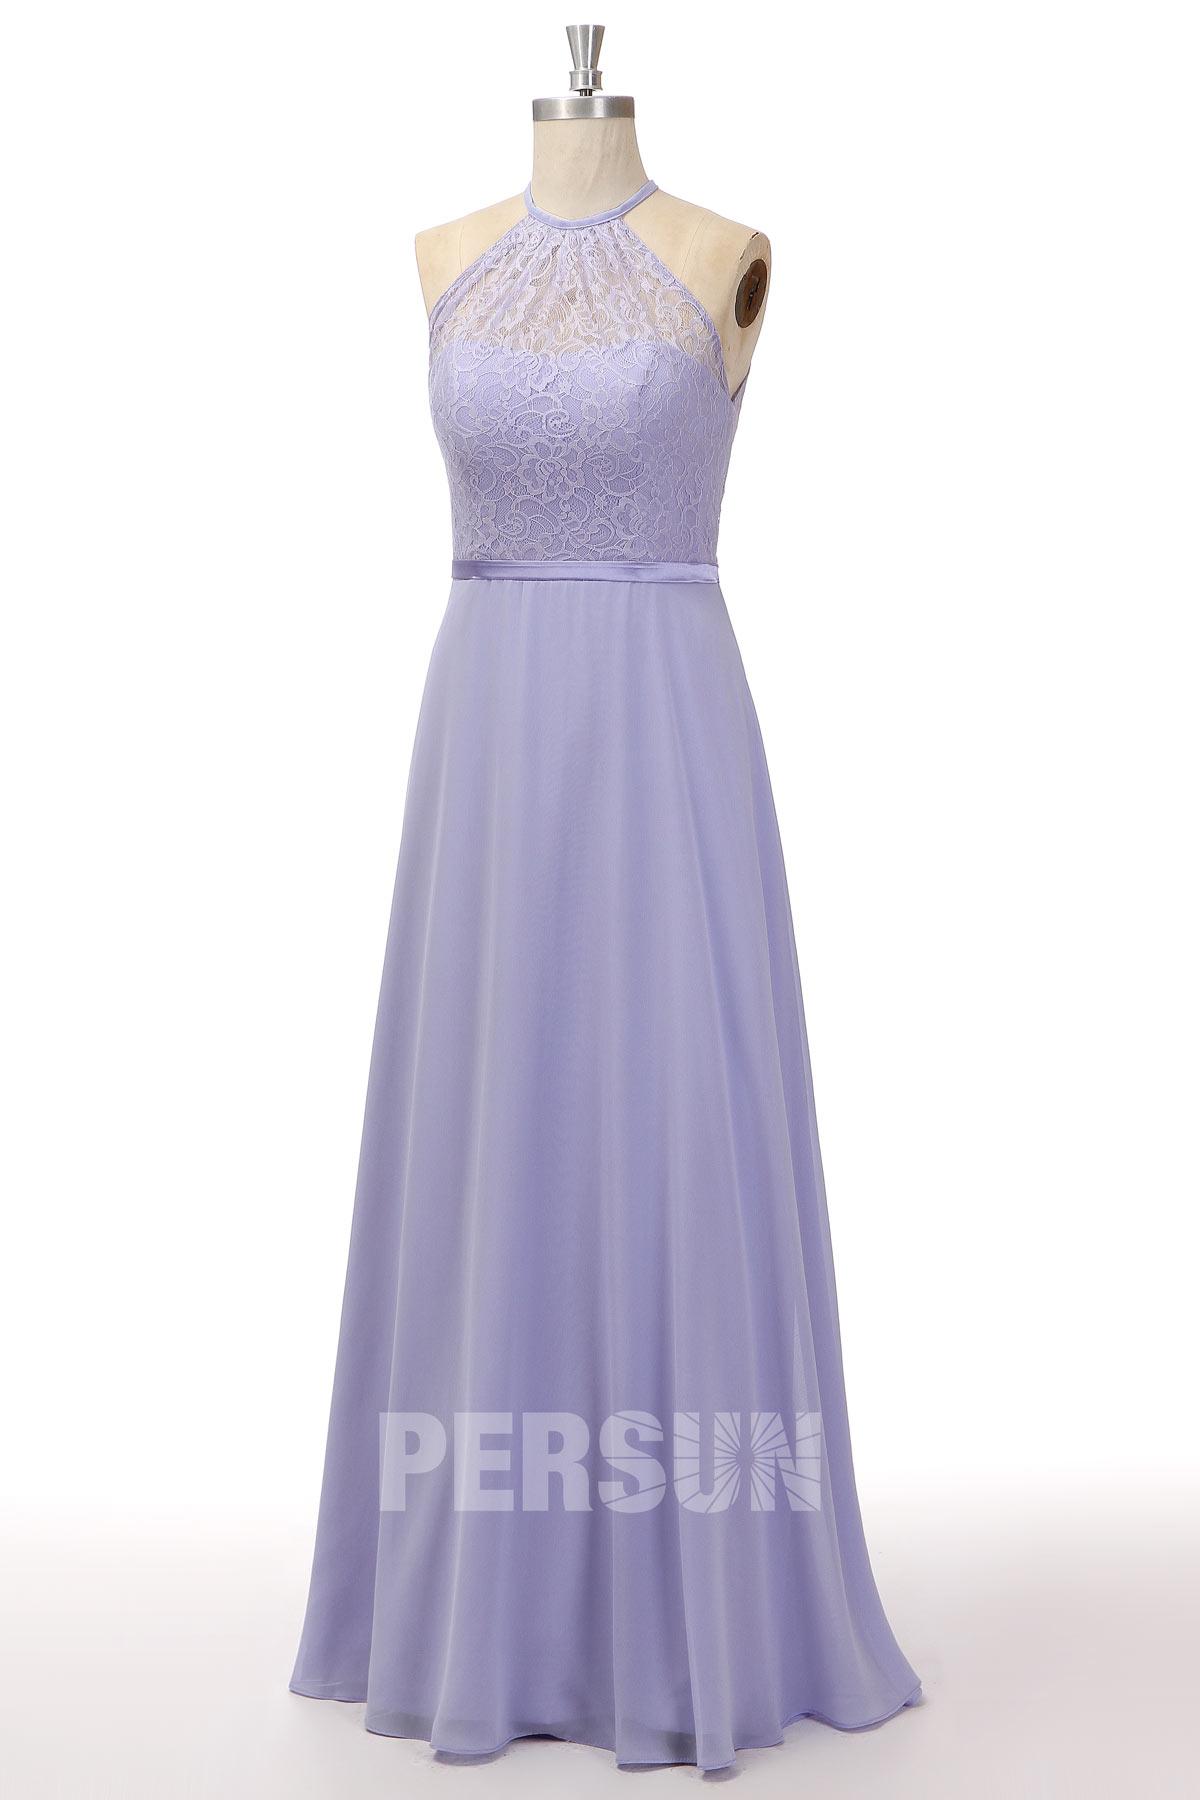 Robe cocktail mariage bleu nuit col illusion en dentelle au genou